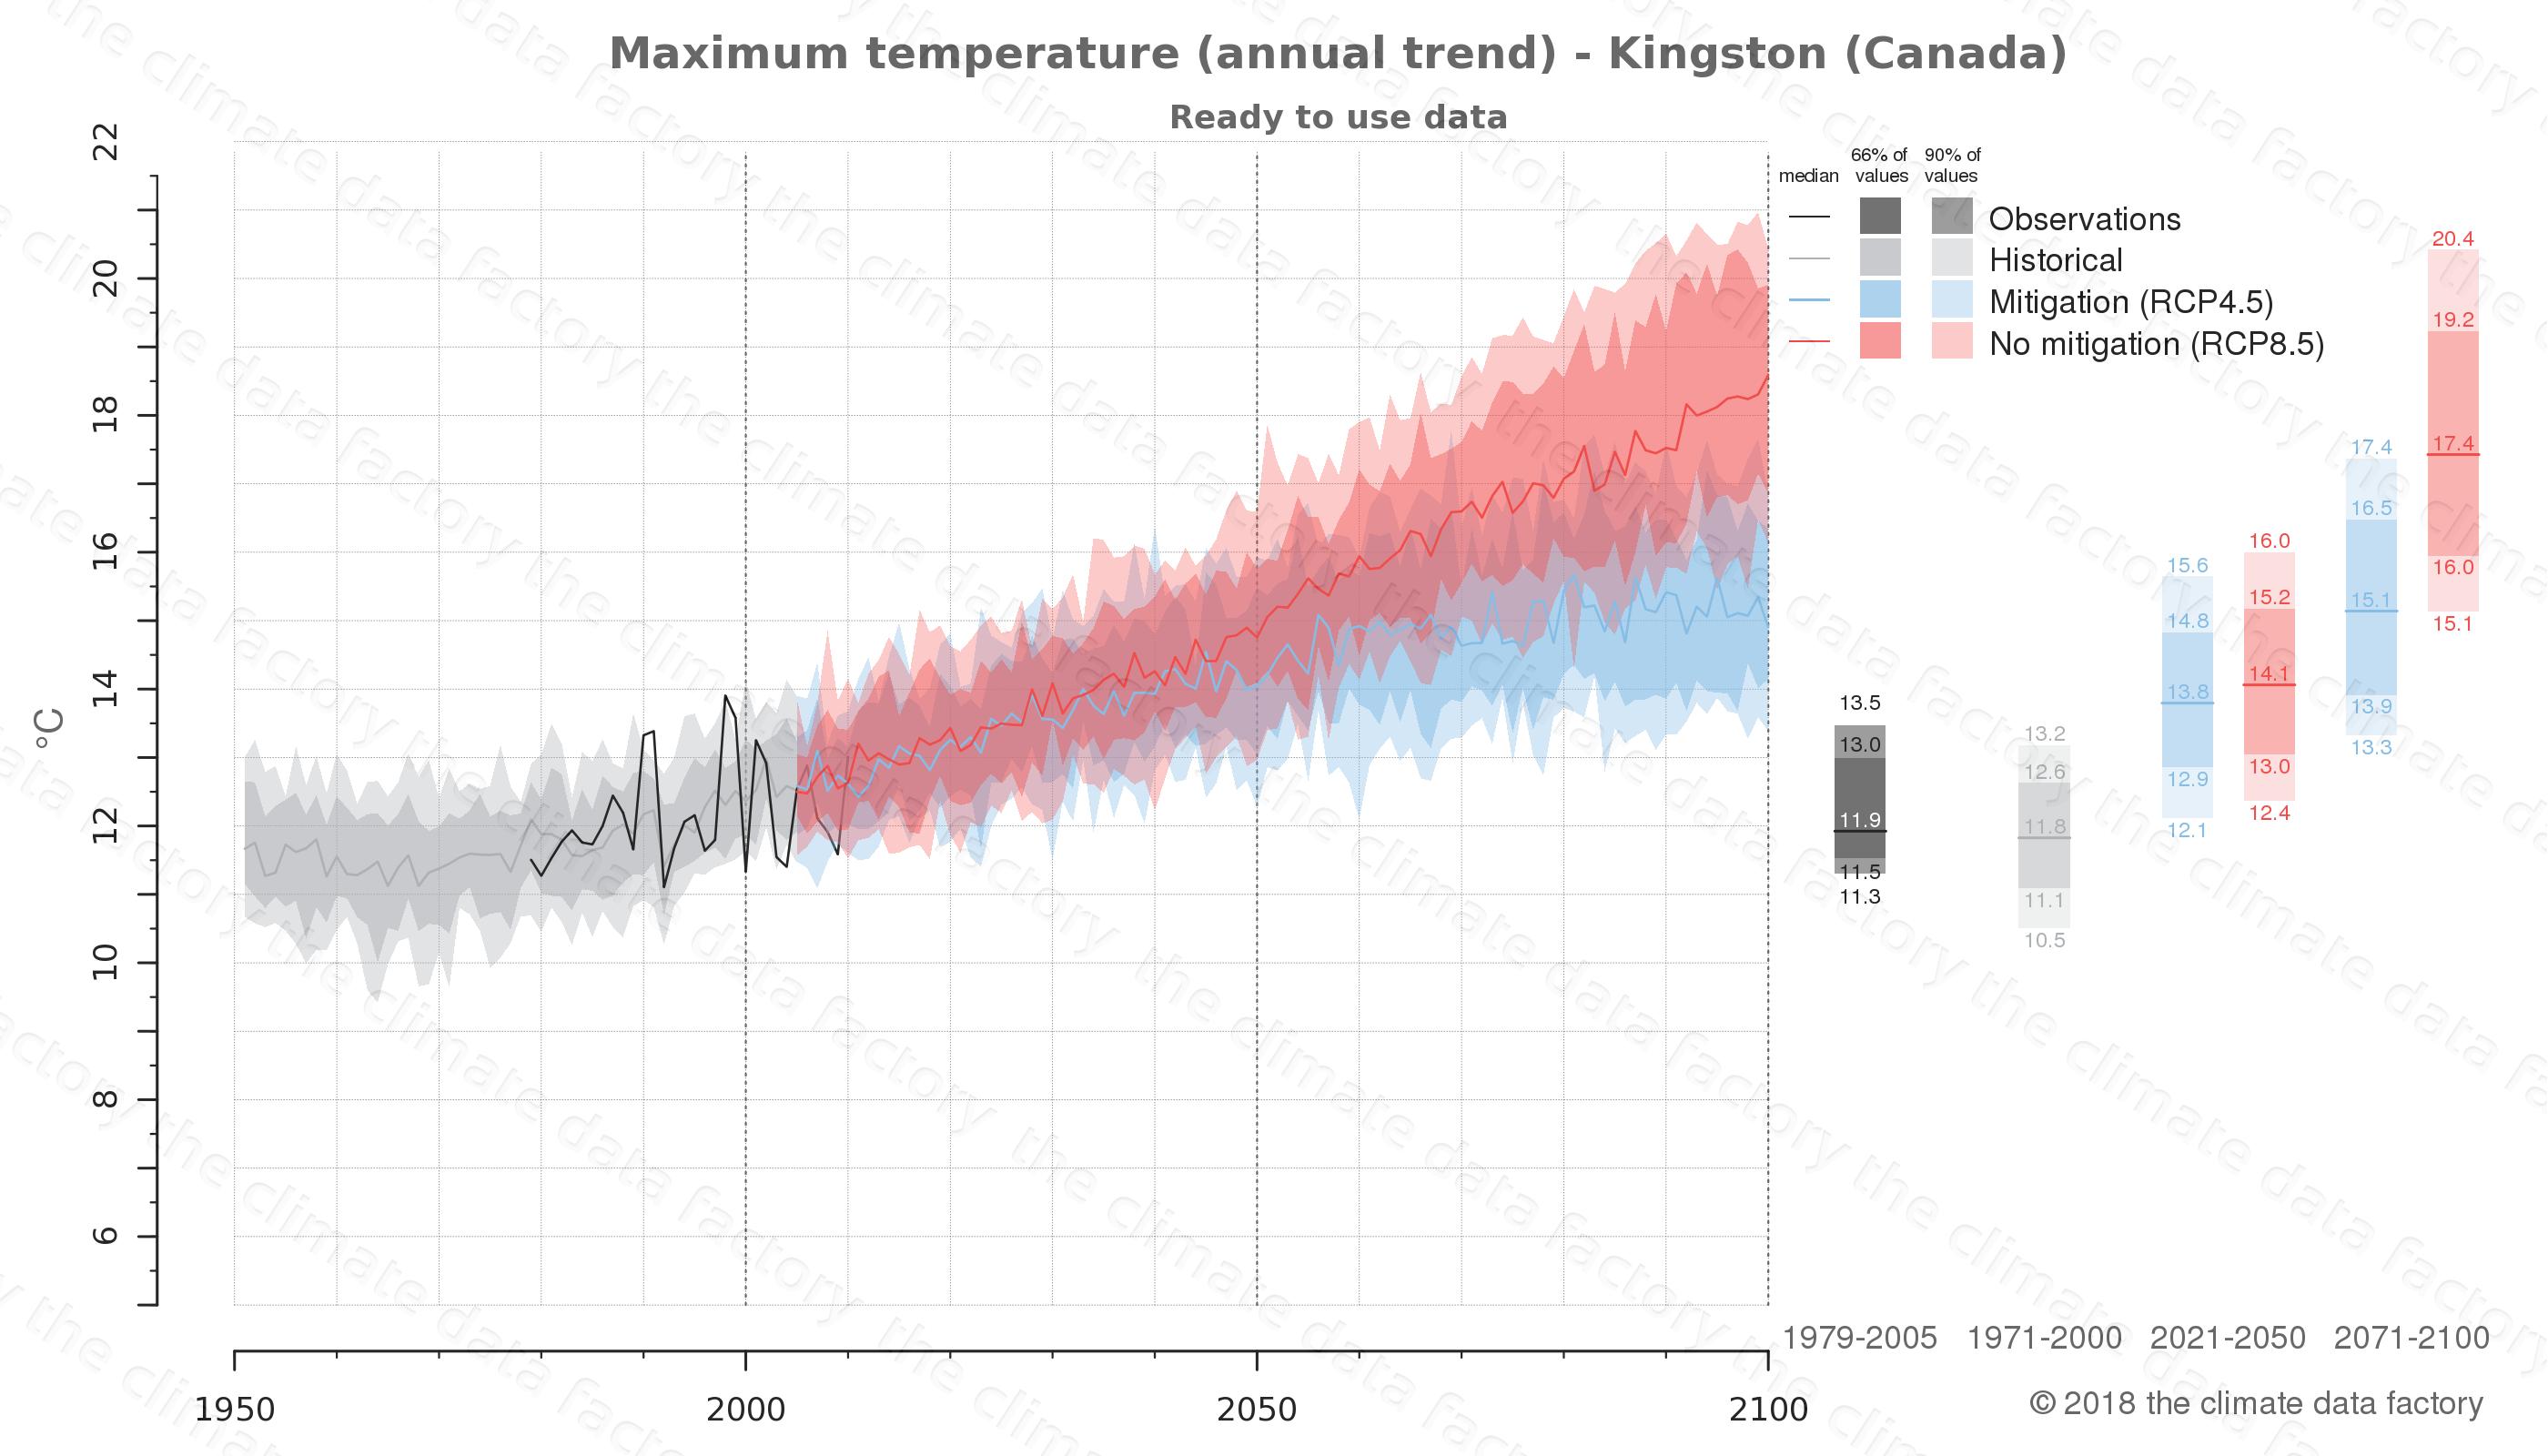 climate change data policy adaptation climate graph city data maximum-temperature kingston canada